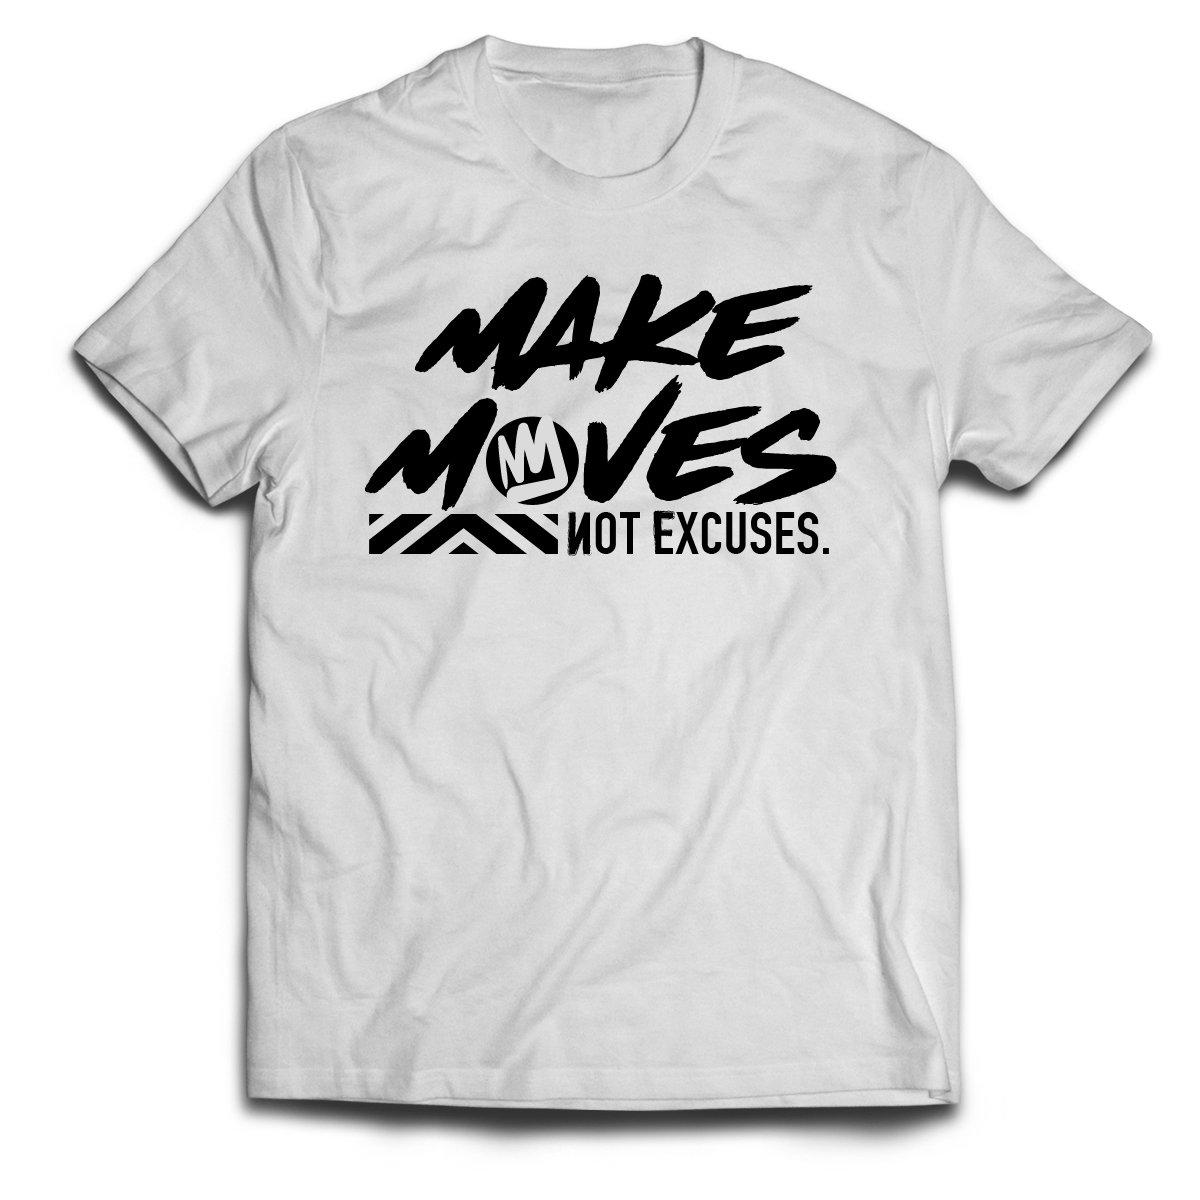 Image of MAKE MOVES T-Shirt